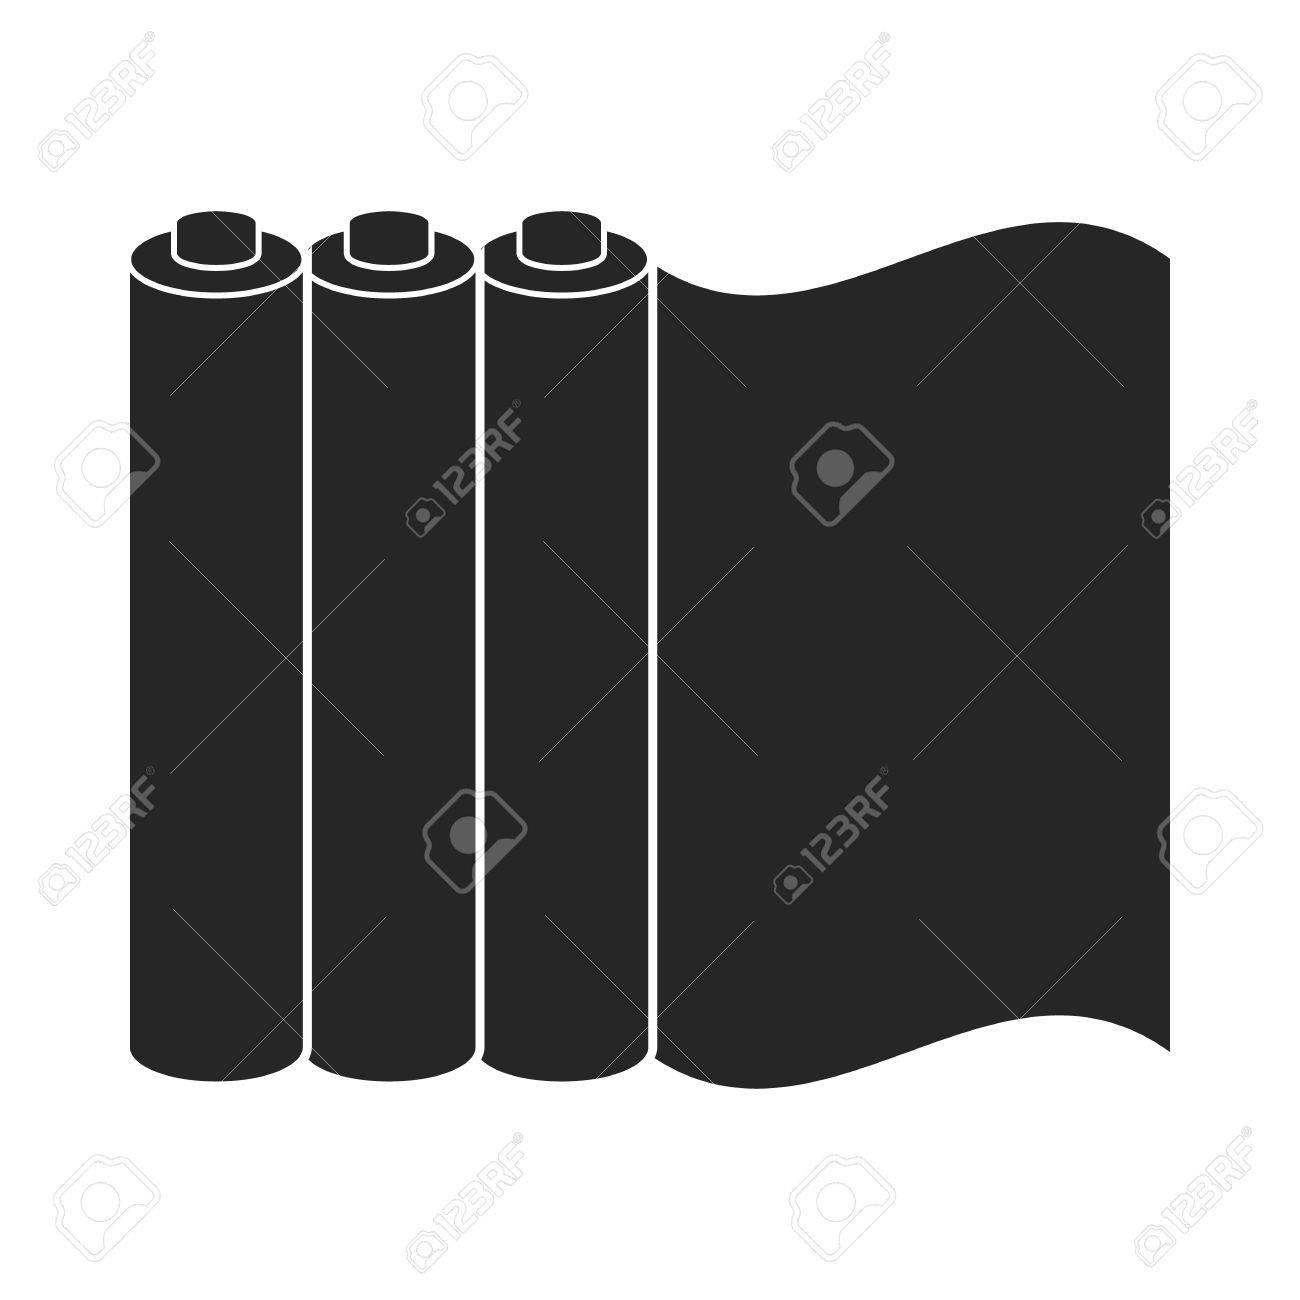 Color printing paper - Color Printing Paper In Black Style Isolated On White Background Typography Symbol Vector Illustration